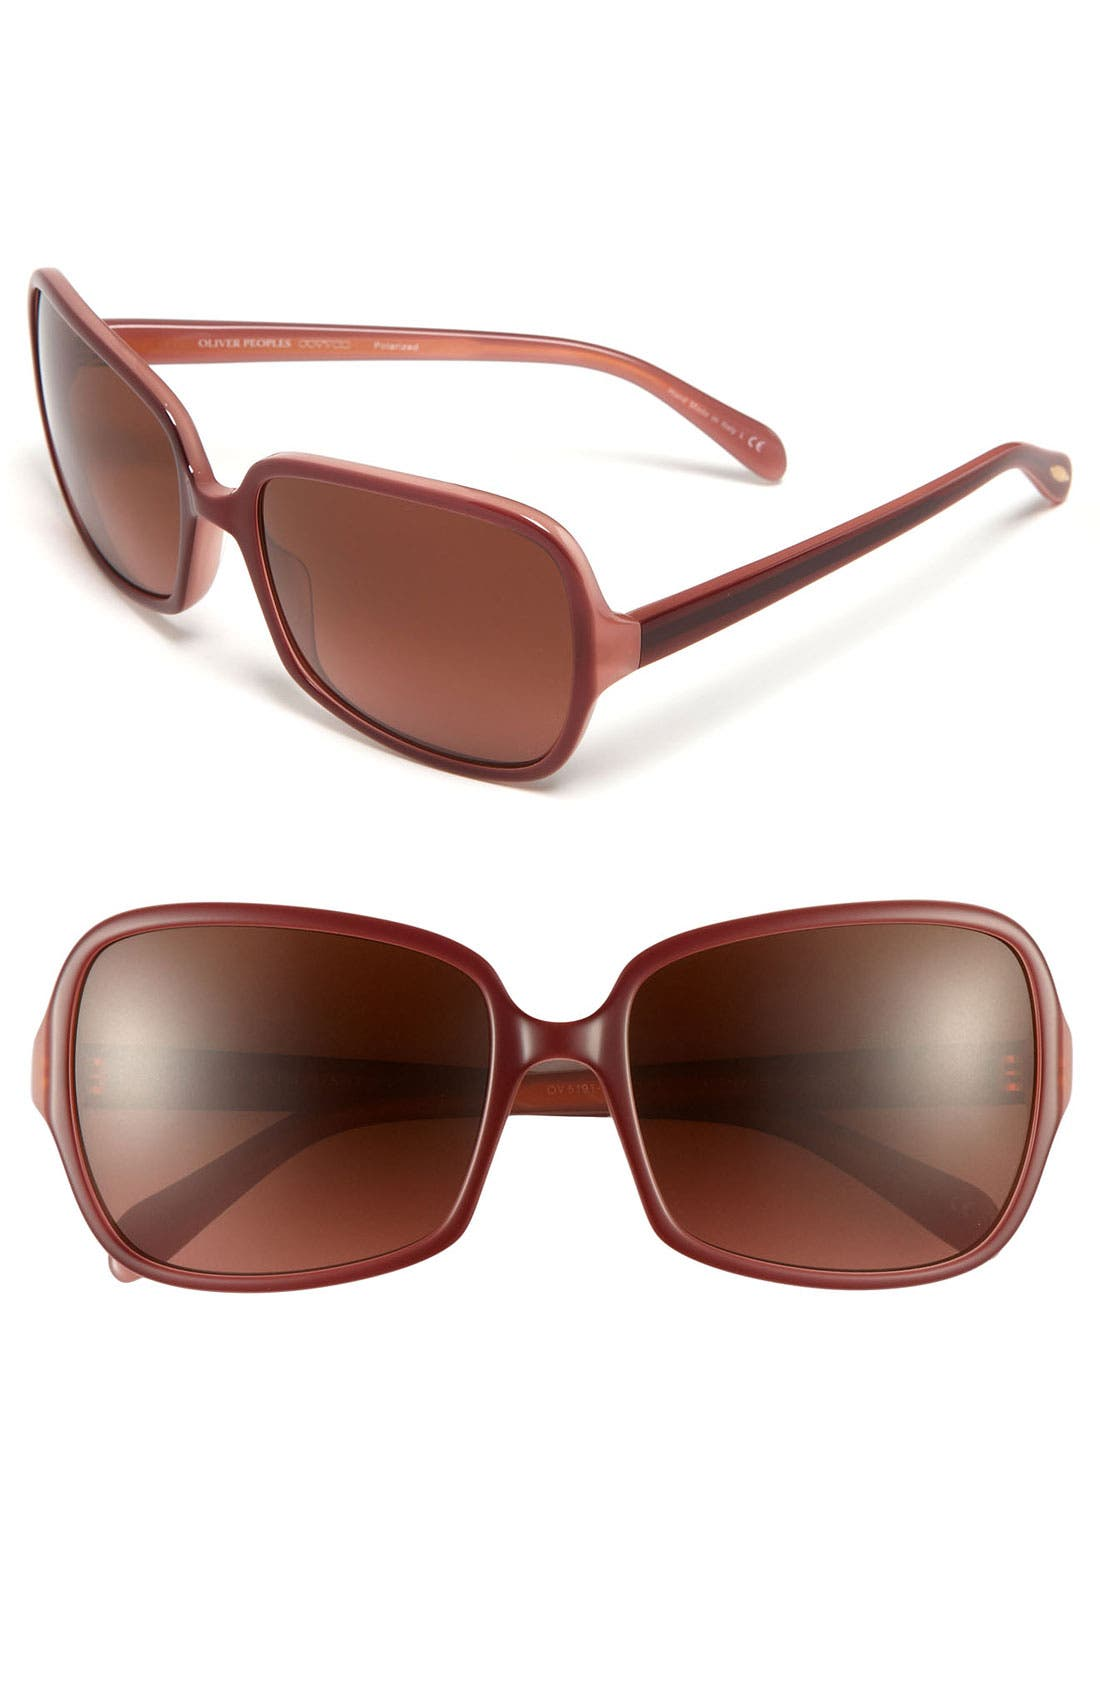 Alternate Image 1 Selected - Oliver Peoples 'Francesca' Polarized Sunglasses